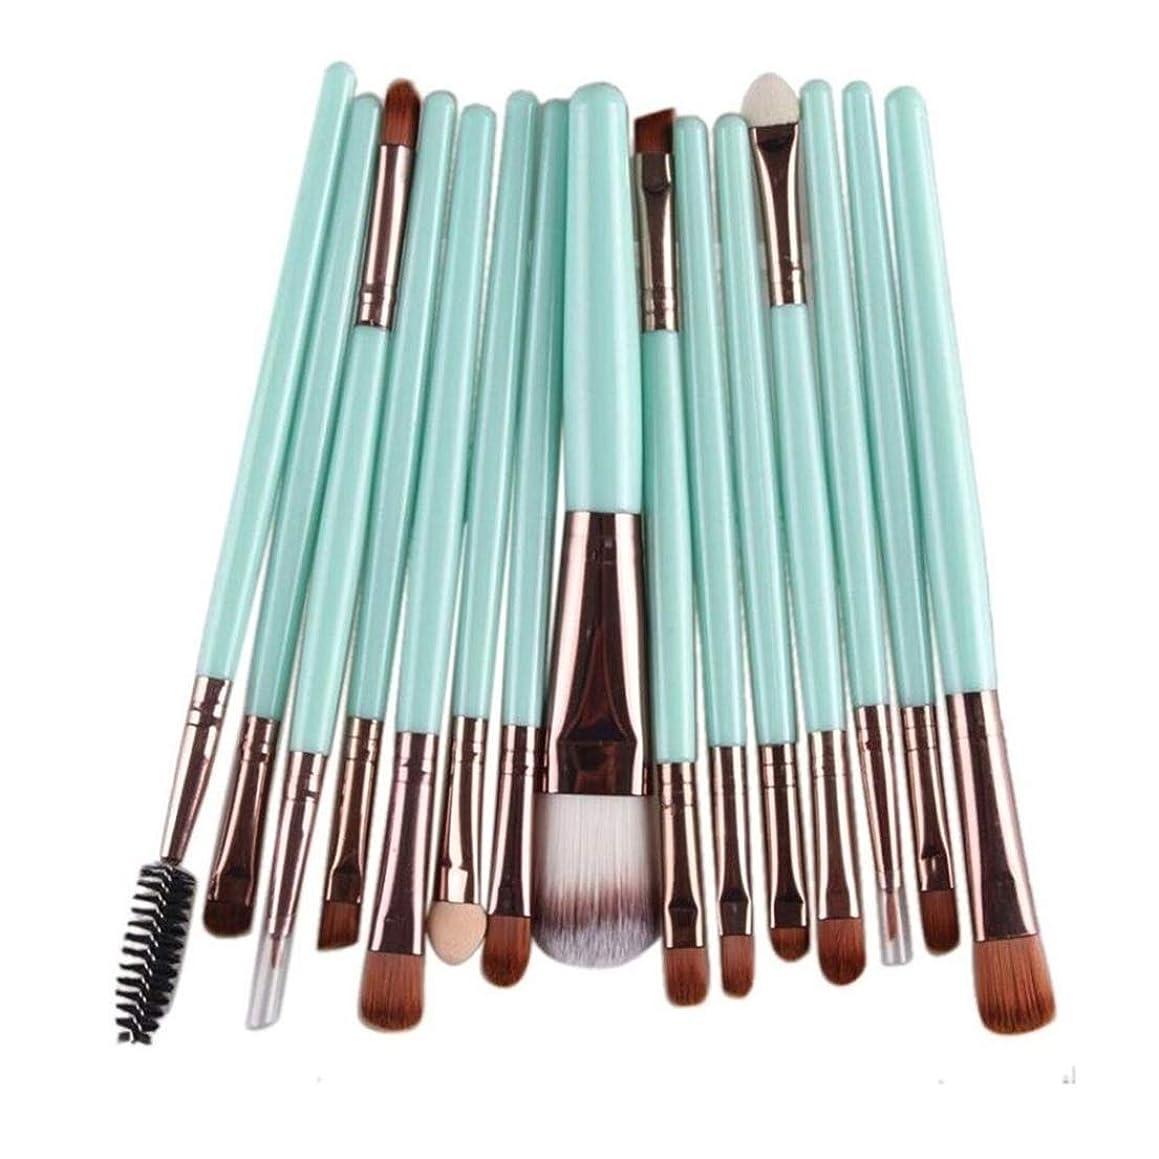 LOSOUL 15pcs Makeup Brush Set Synthetic Kabuki Comestics Foundation Blending Blush Eyeliner Face Powder Brush Comestic Tool